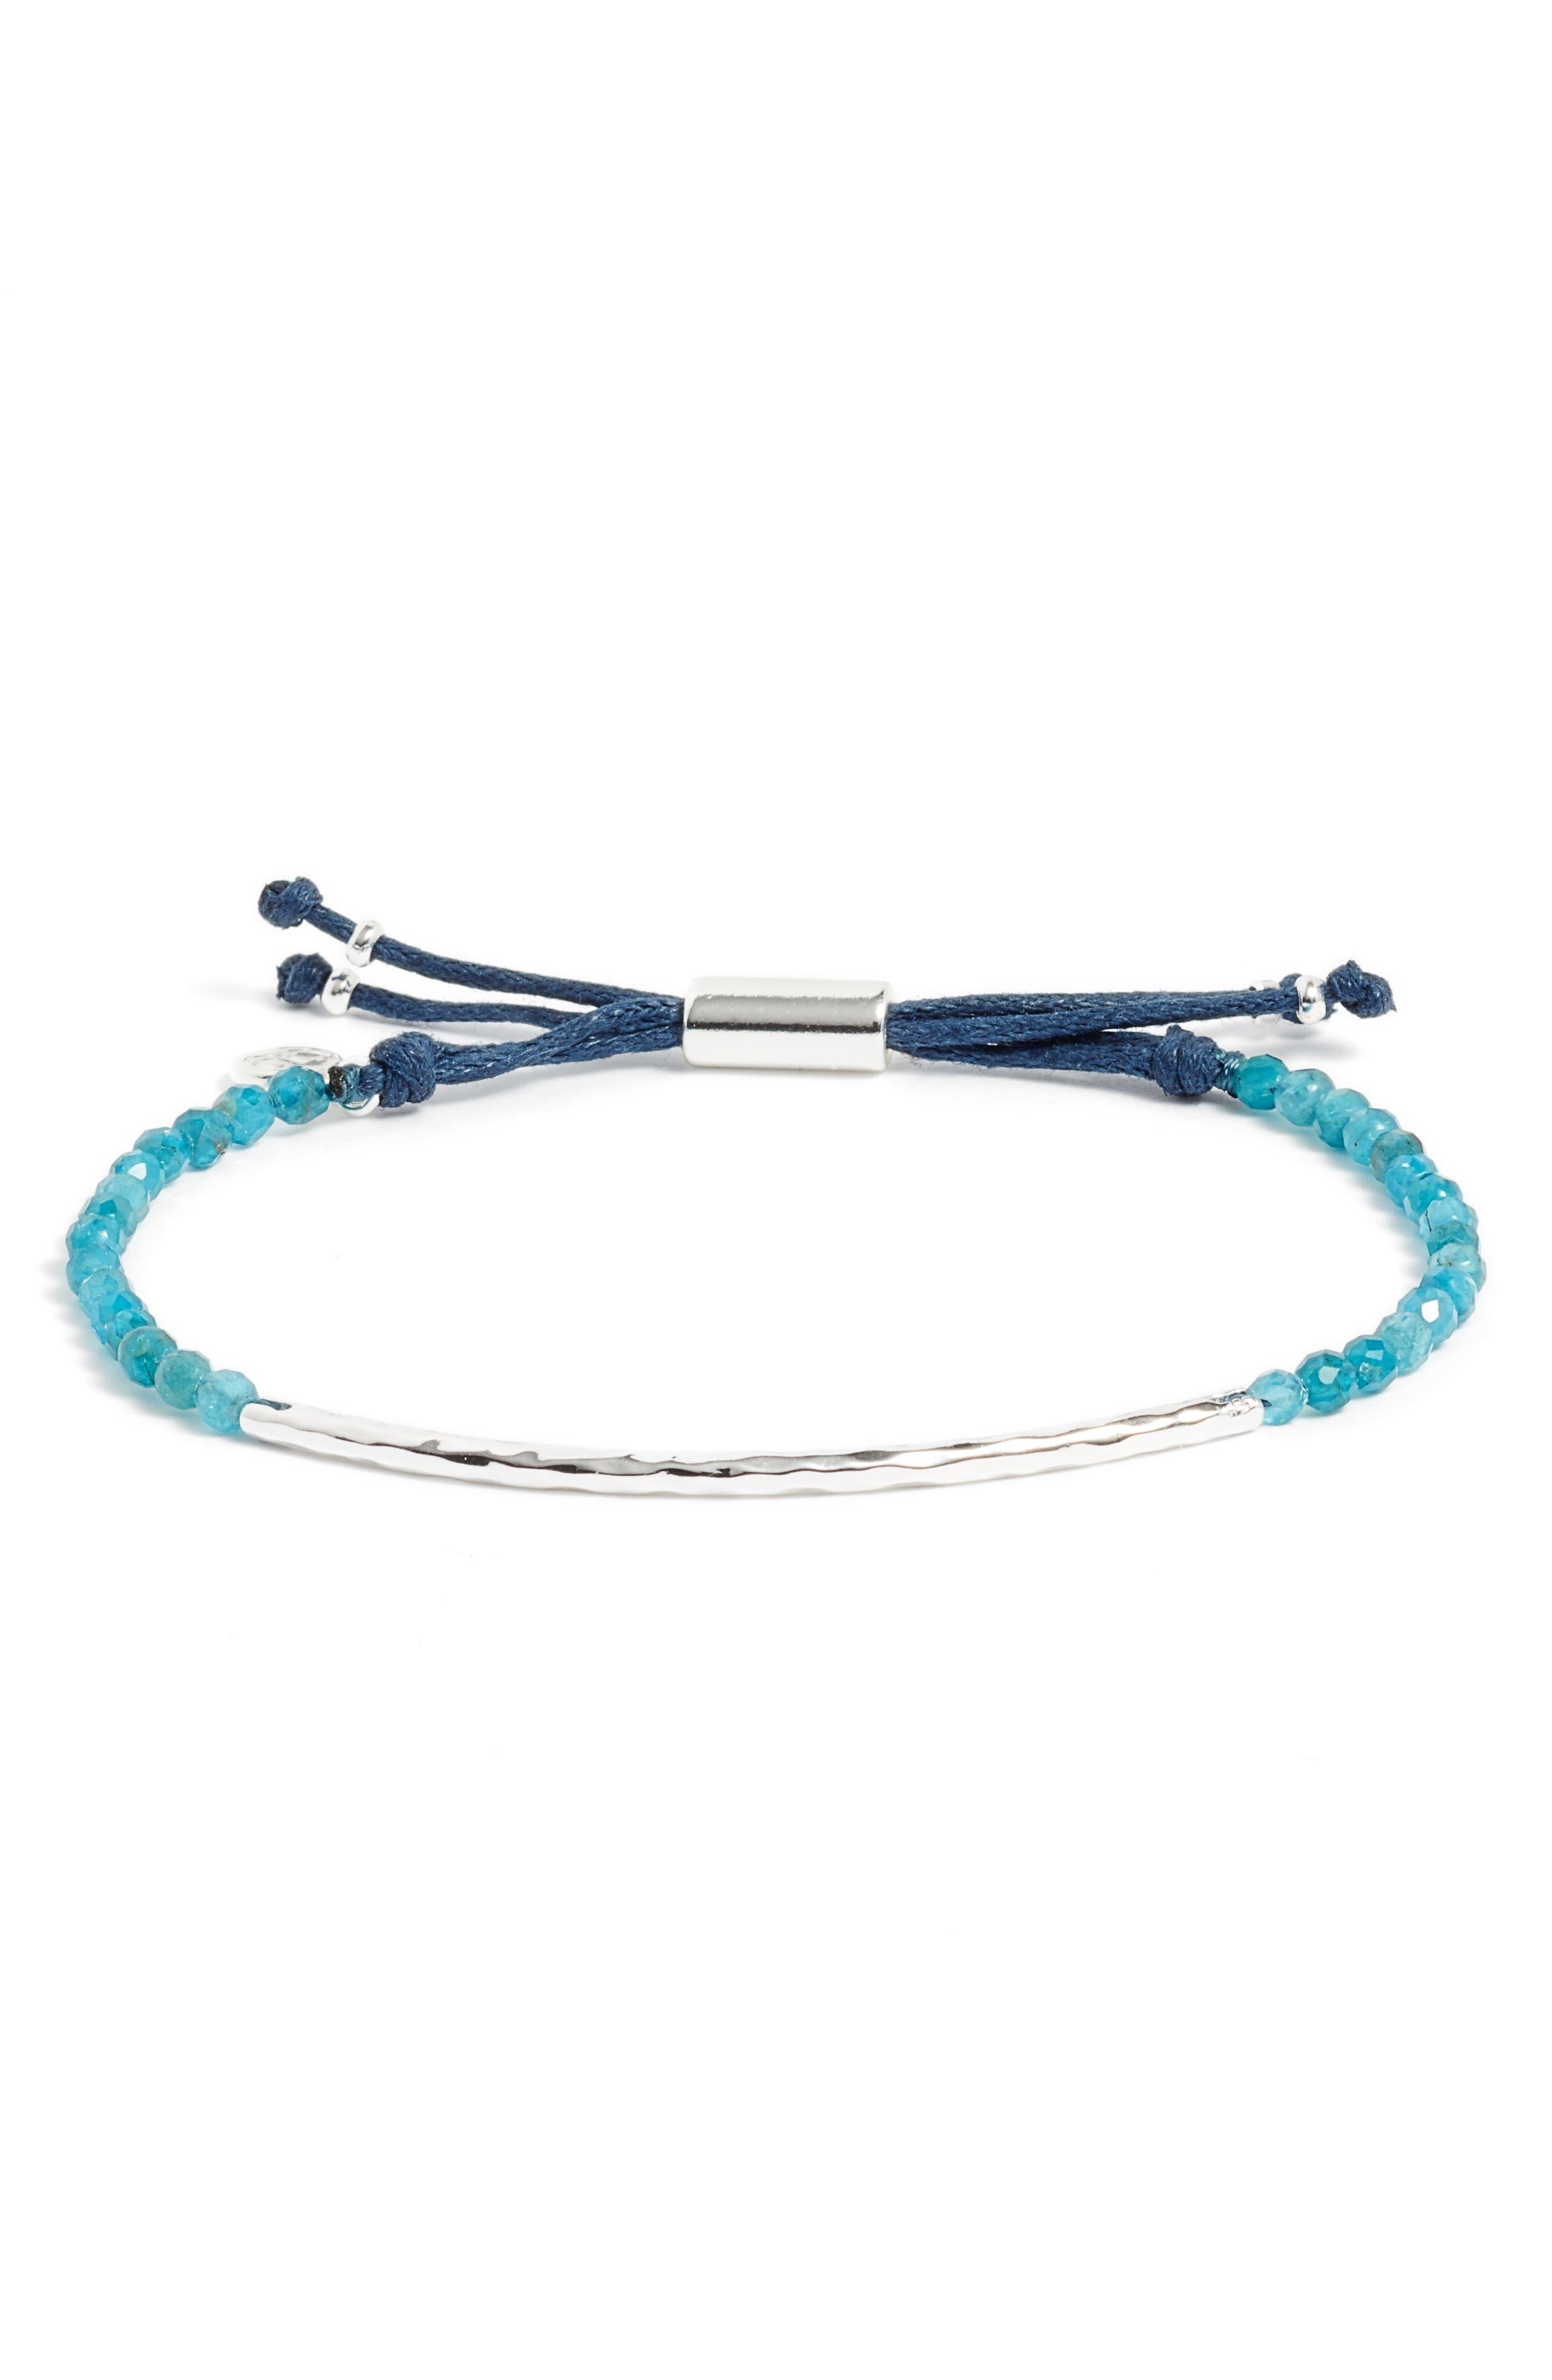 Inspiration Gemstone Bracelet,                             Main thumbnail 1, color,                             APATITE/ SILVER